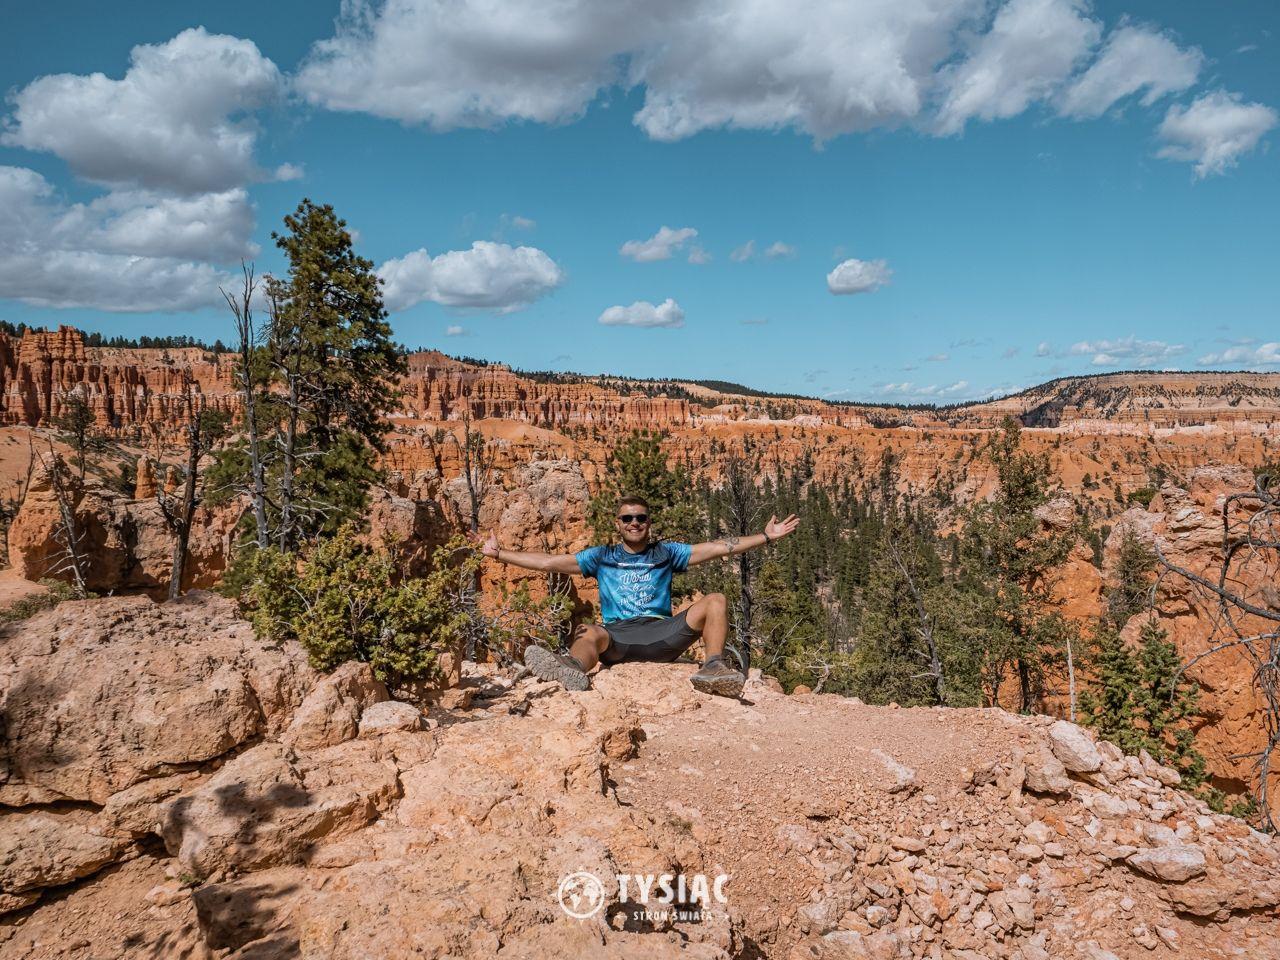 Szlak Peek-A-Boo w Bryce